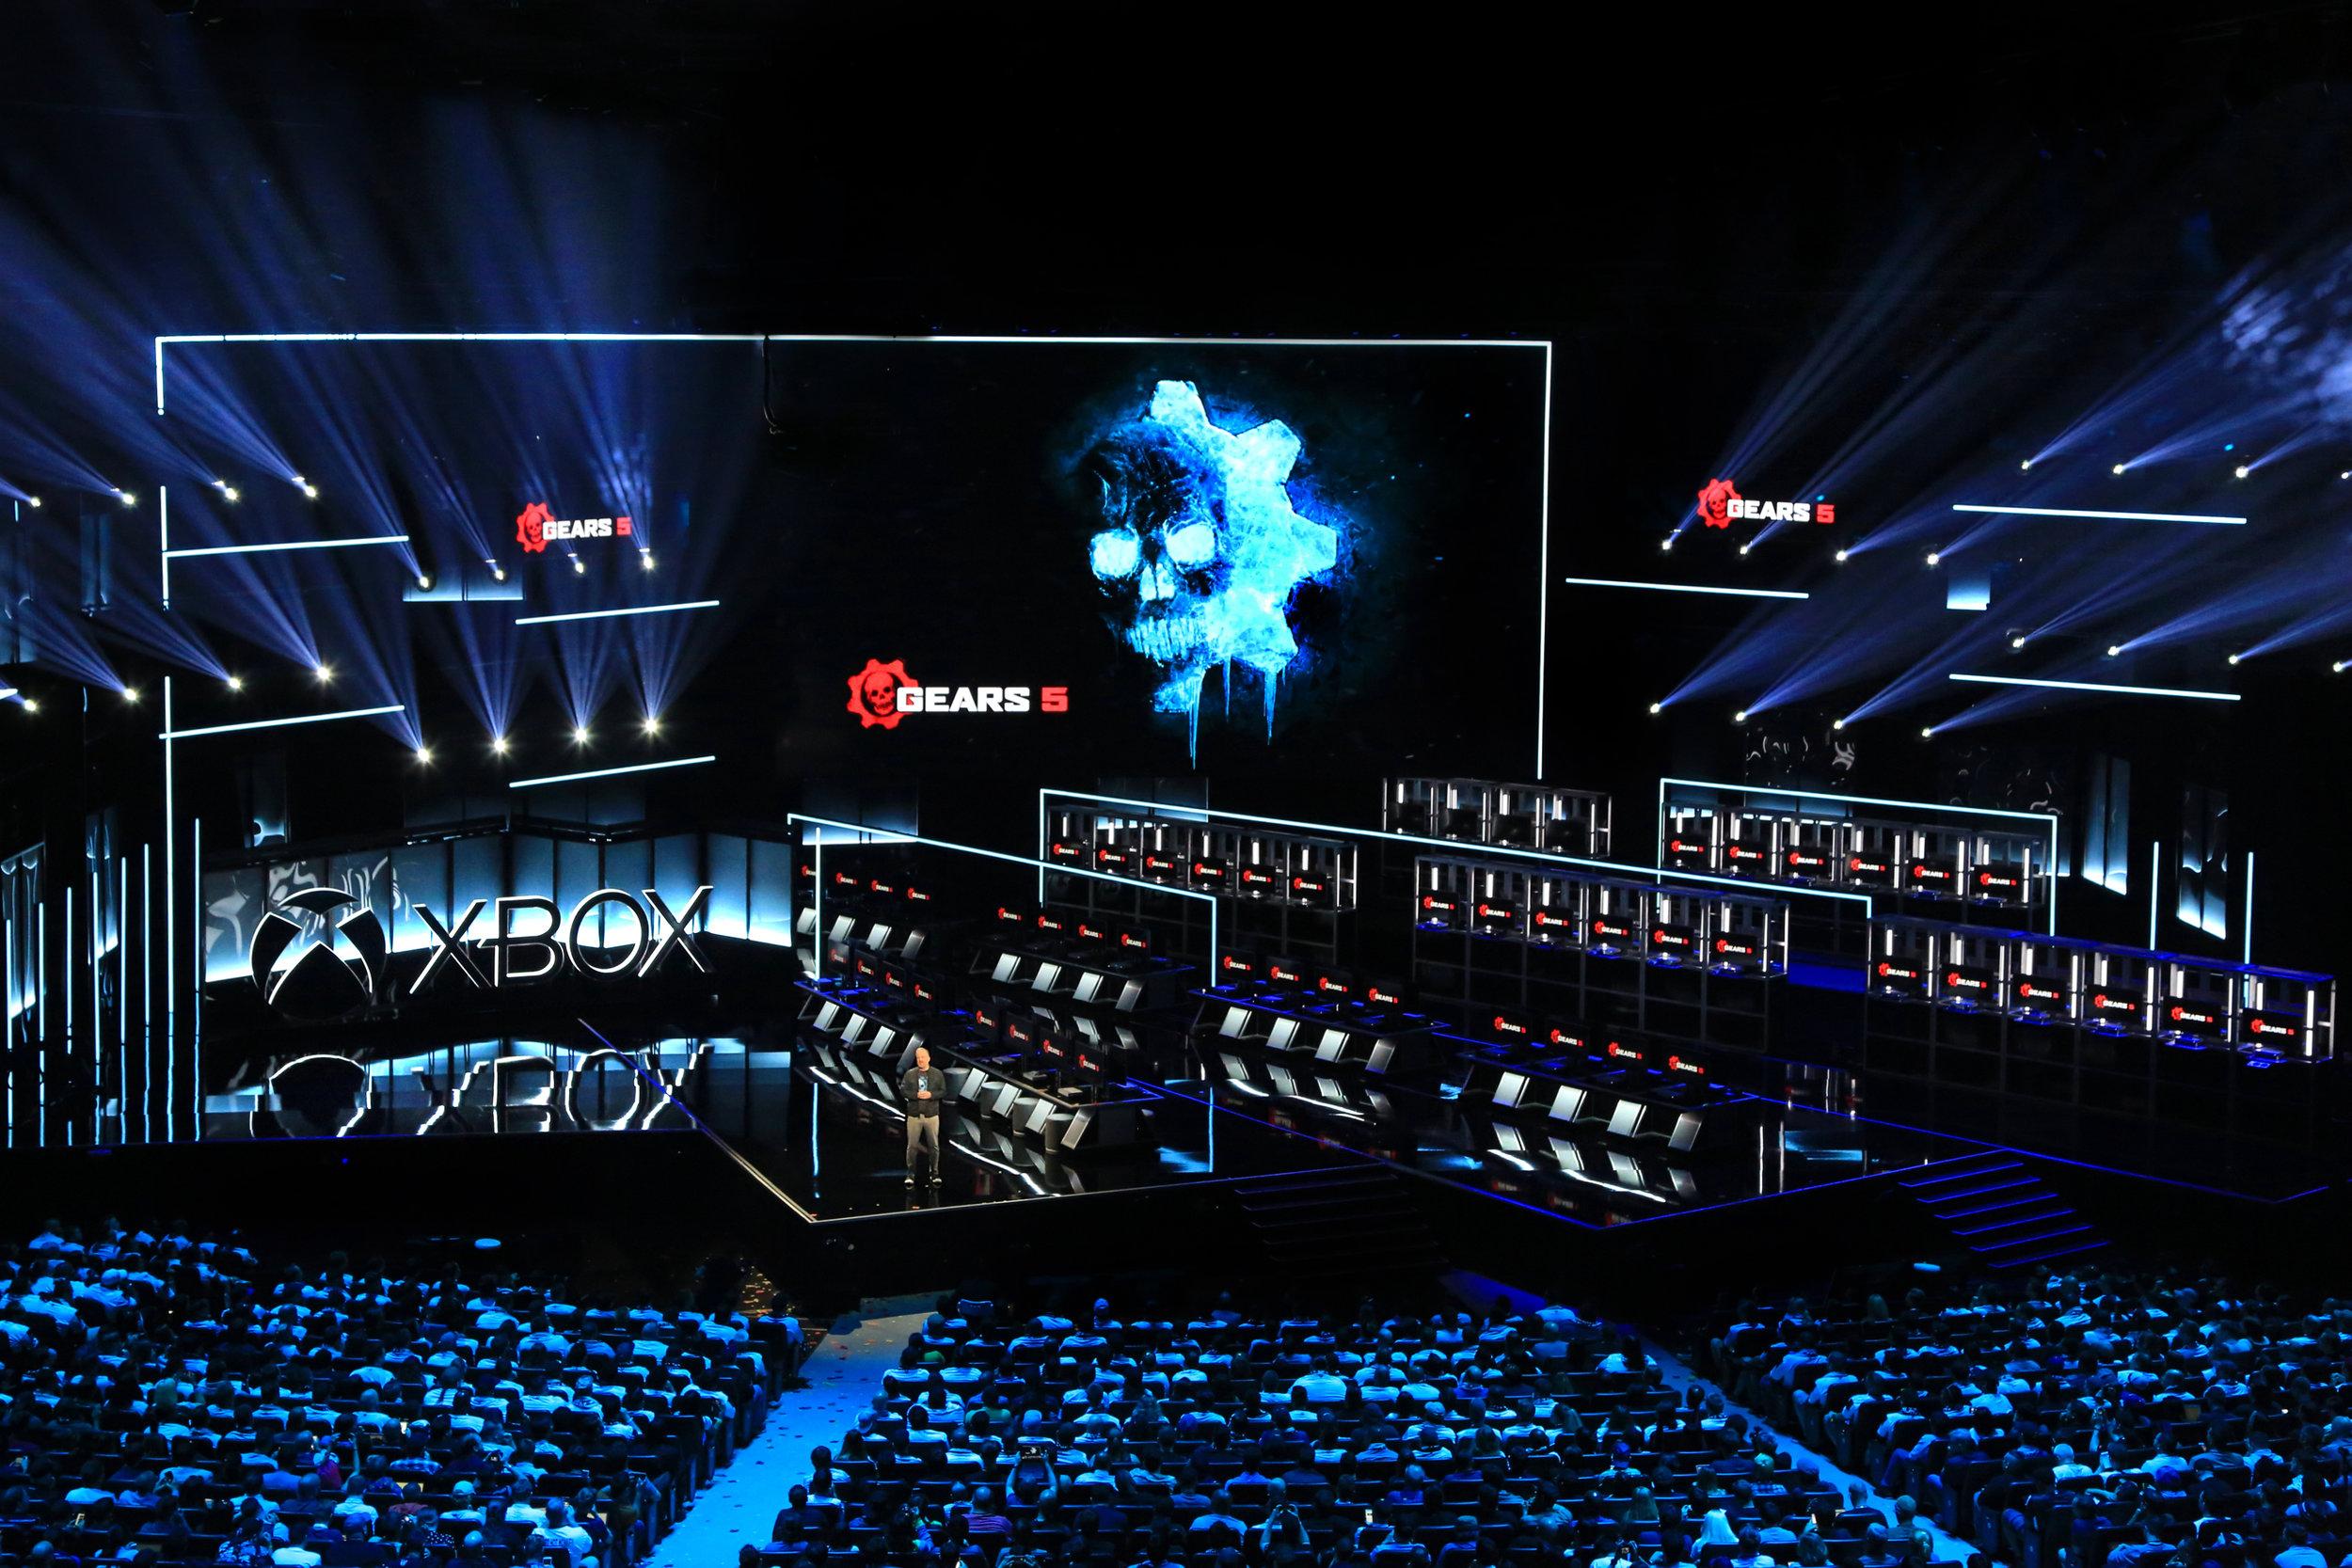 Xbox 2018 E3 Media Briefing